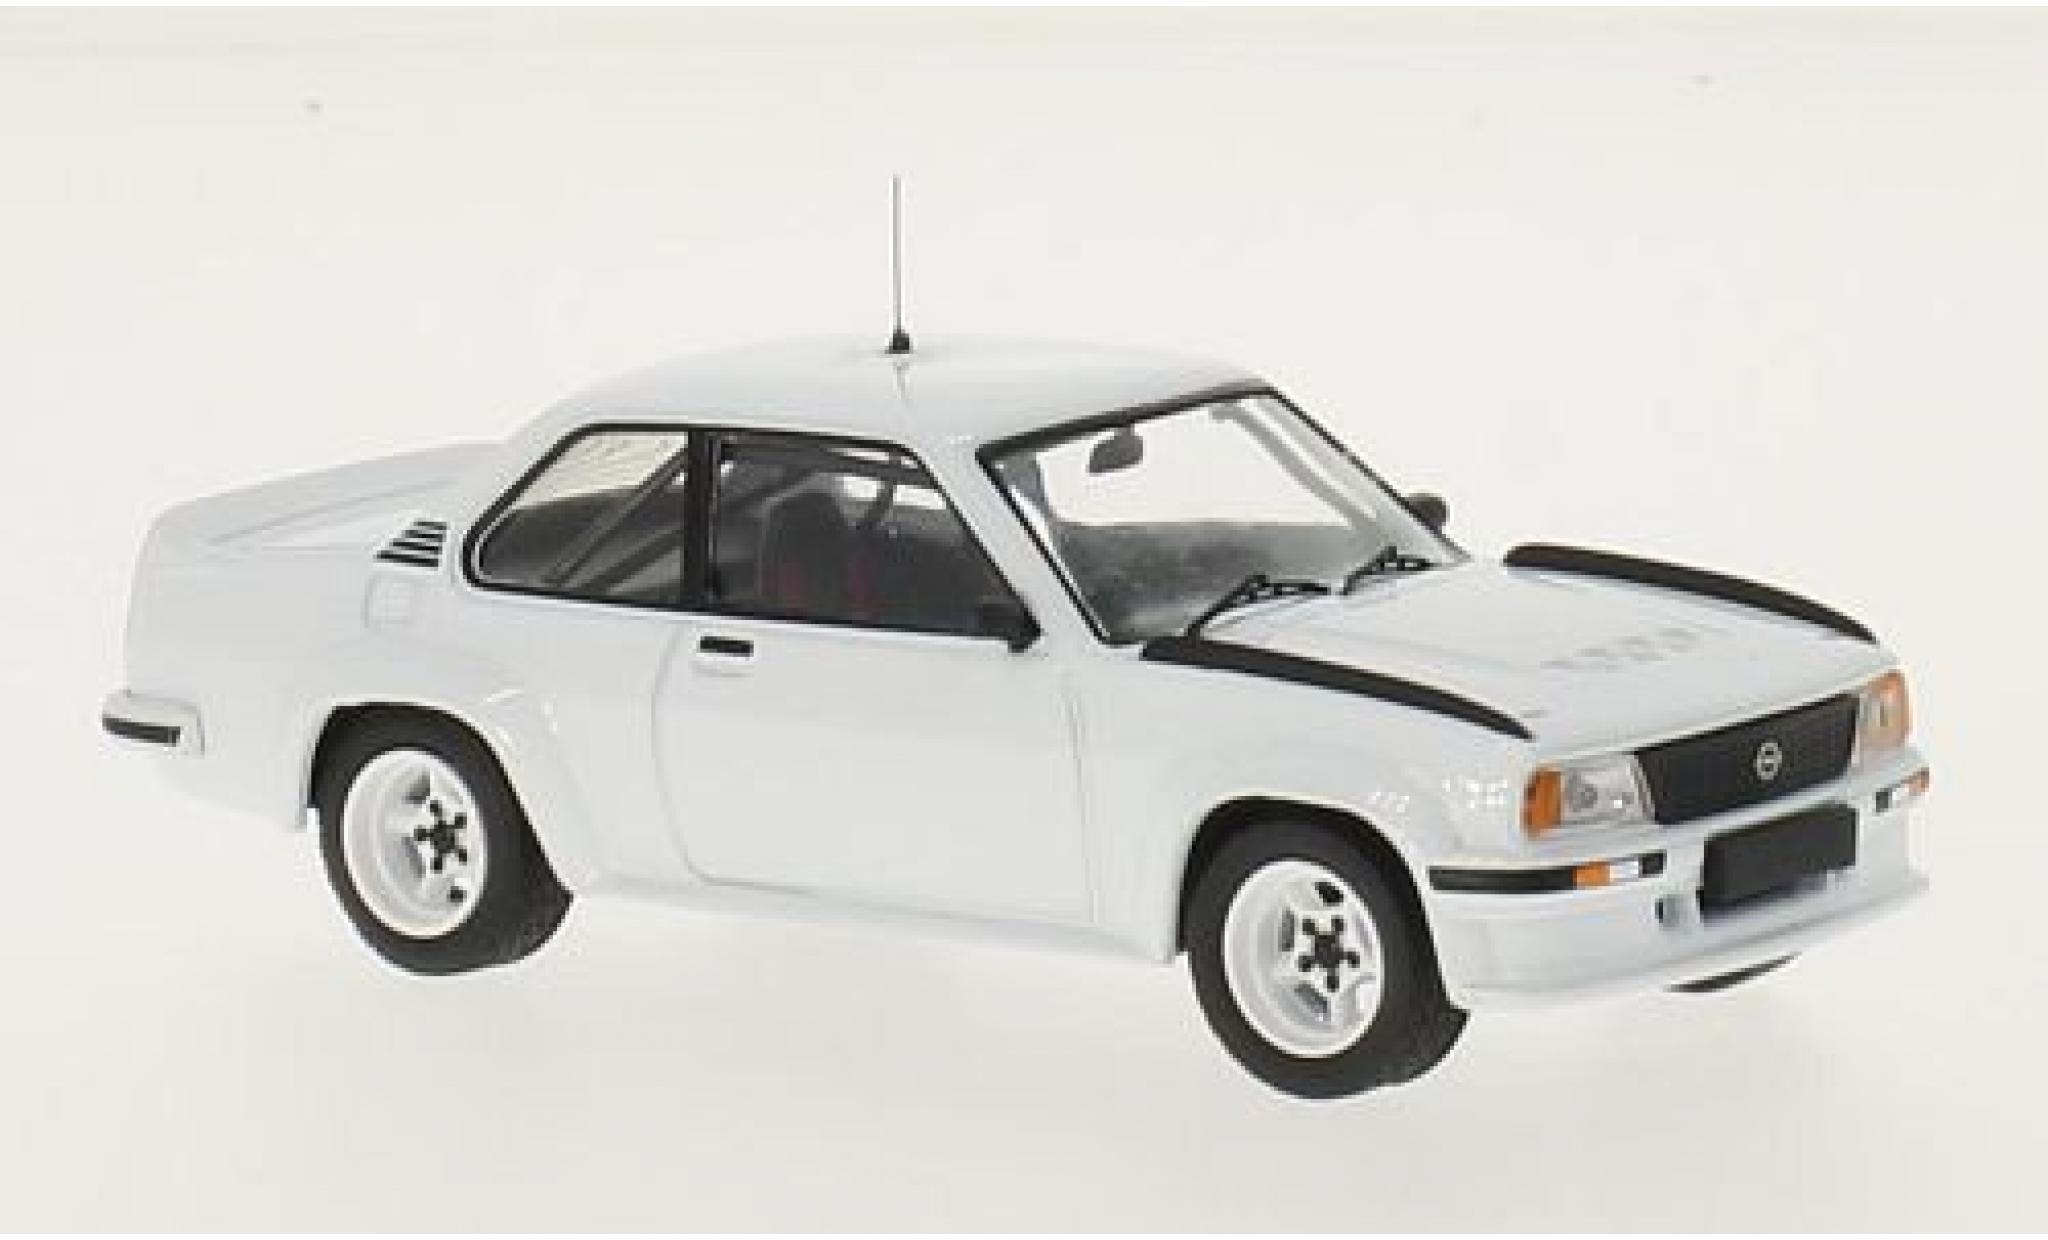 Opel Ascona 1/43 IXO B 400 blanche RHD 1981 Plain Body Version y compris les 4 Ersatzräder